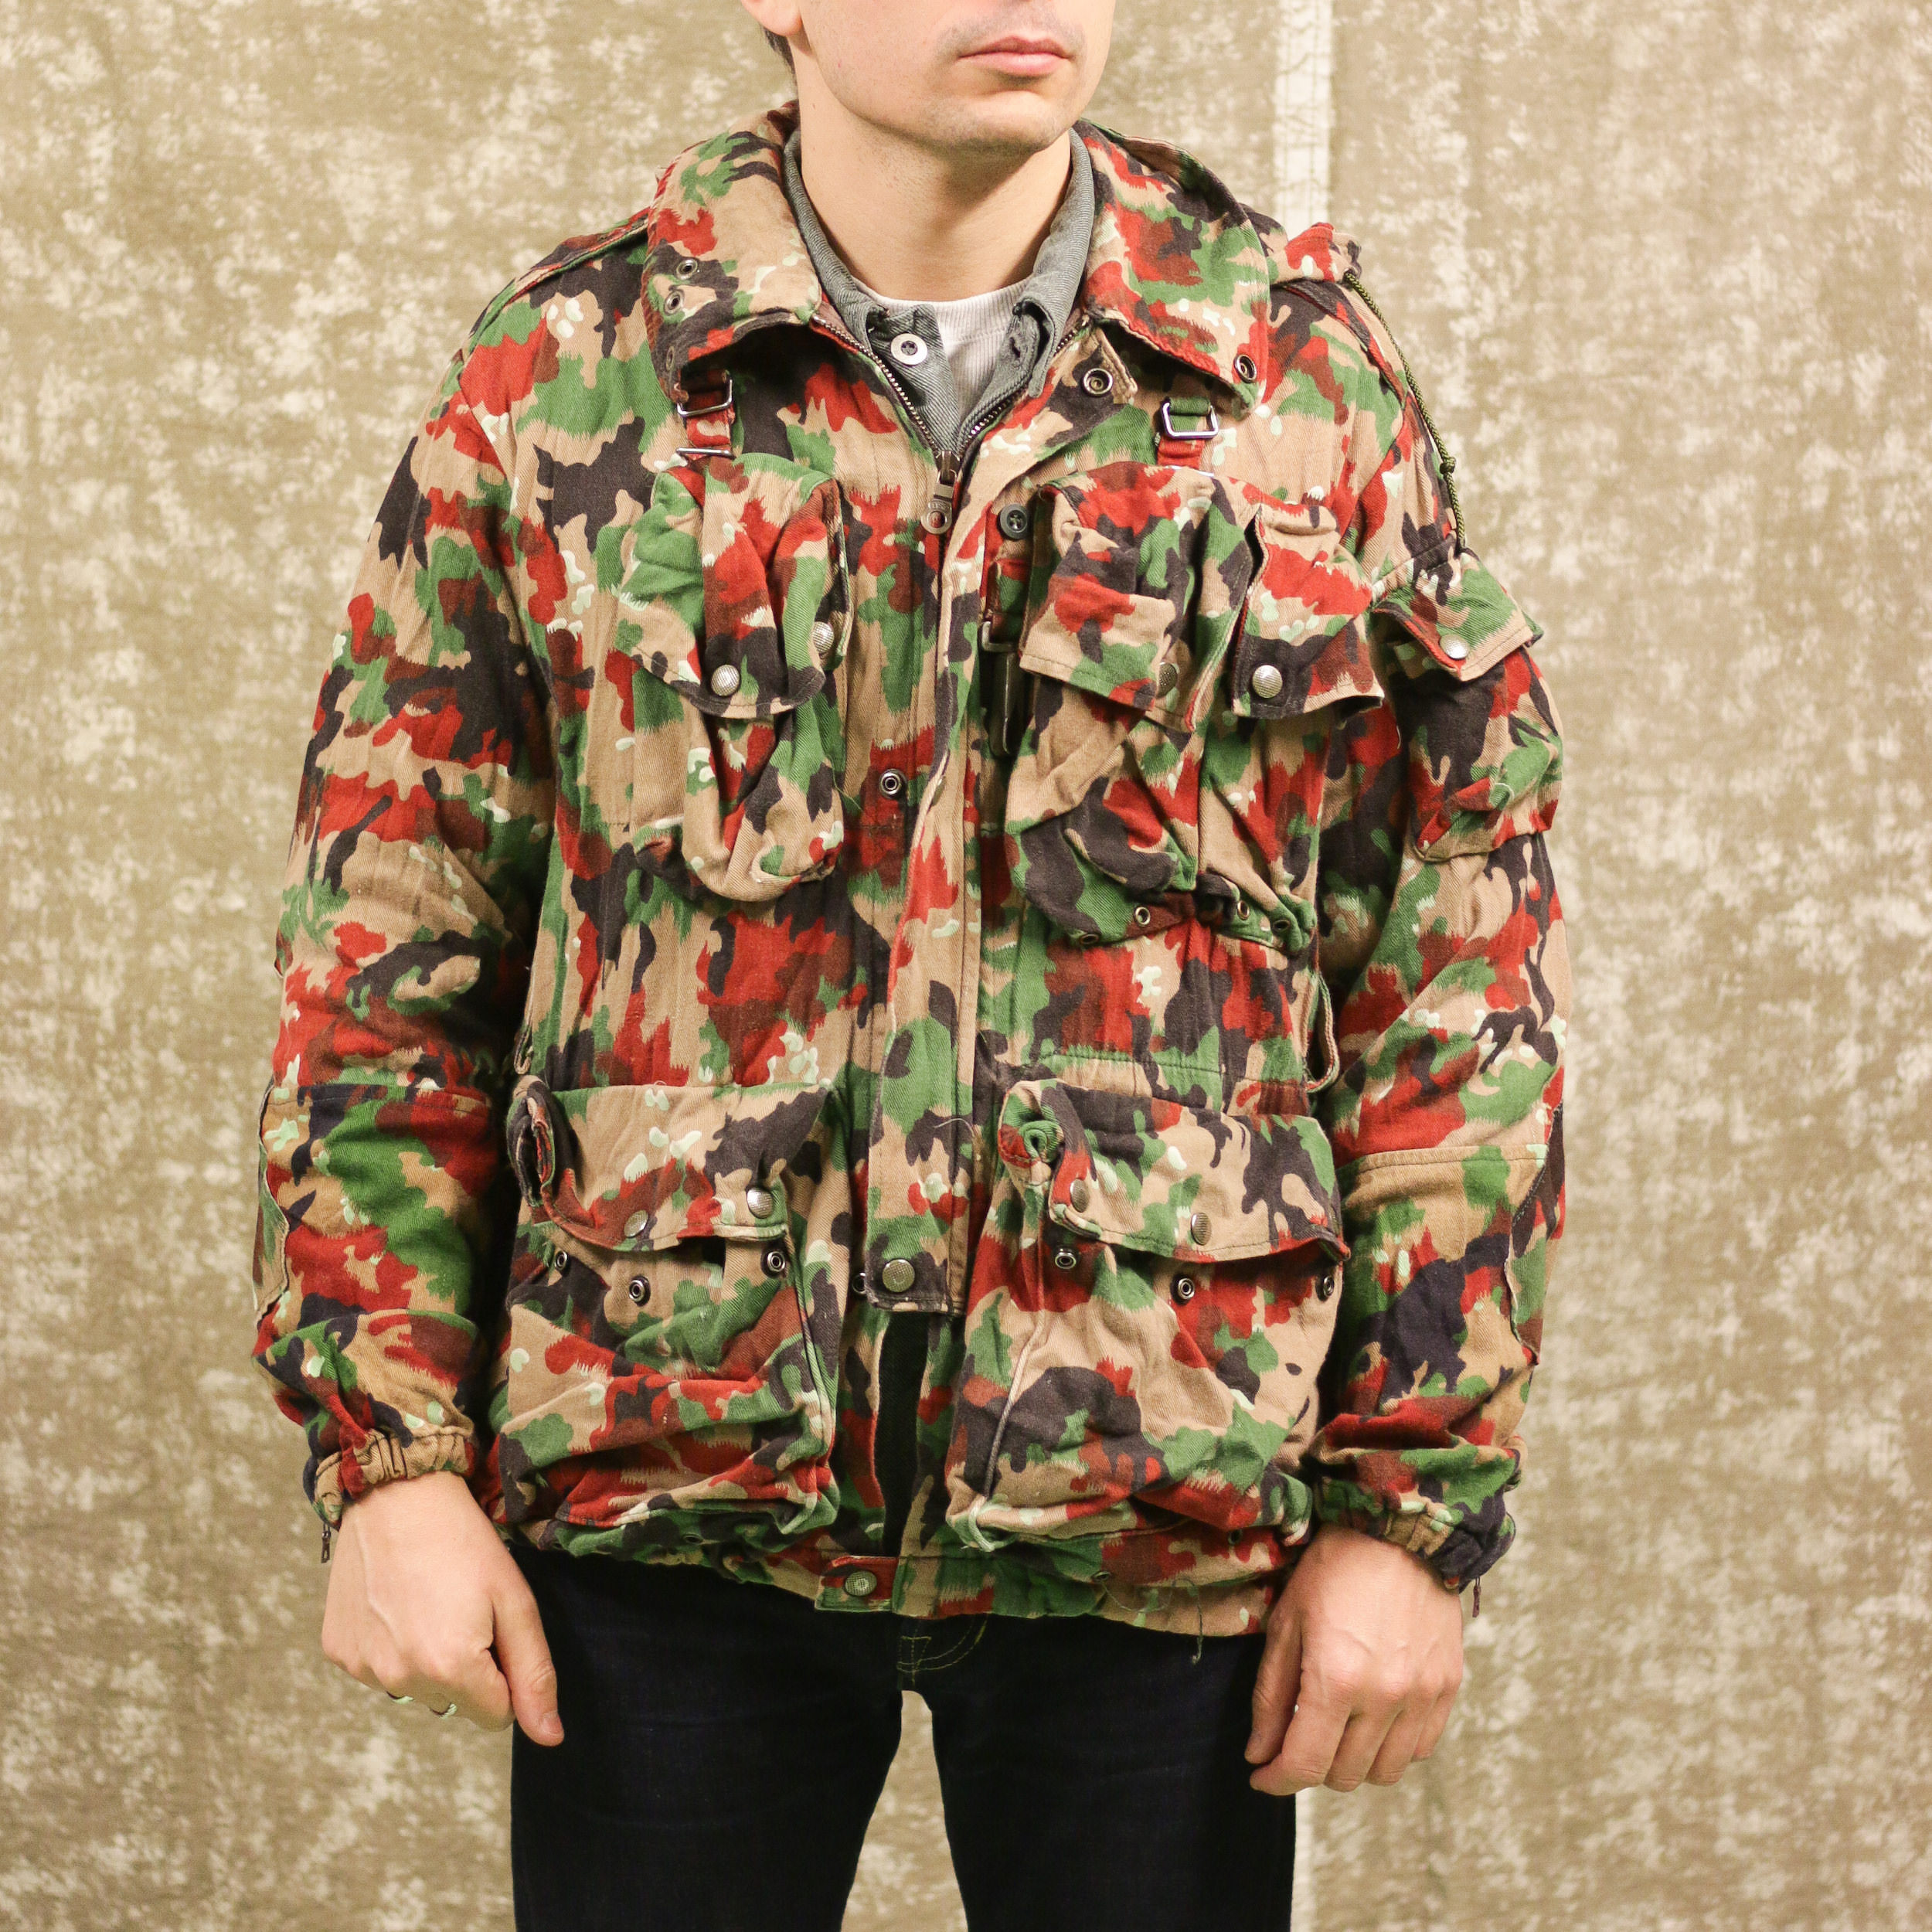 Veste Armee Suisse camouflage Alpenflage avant